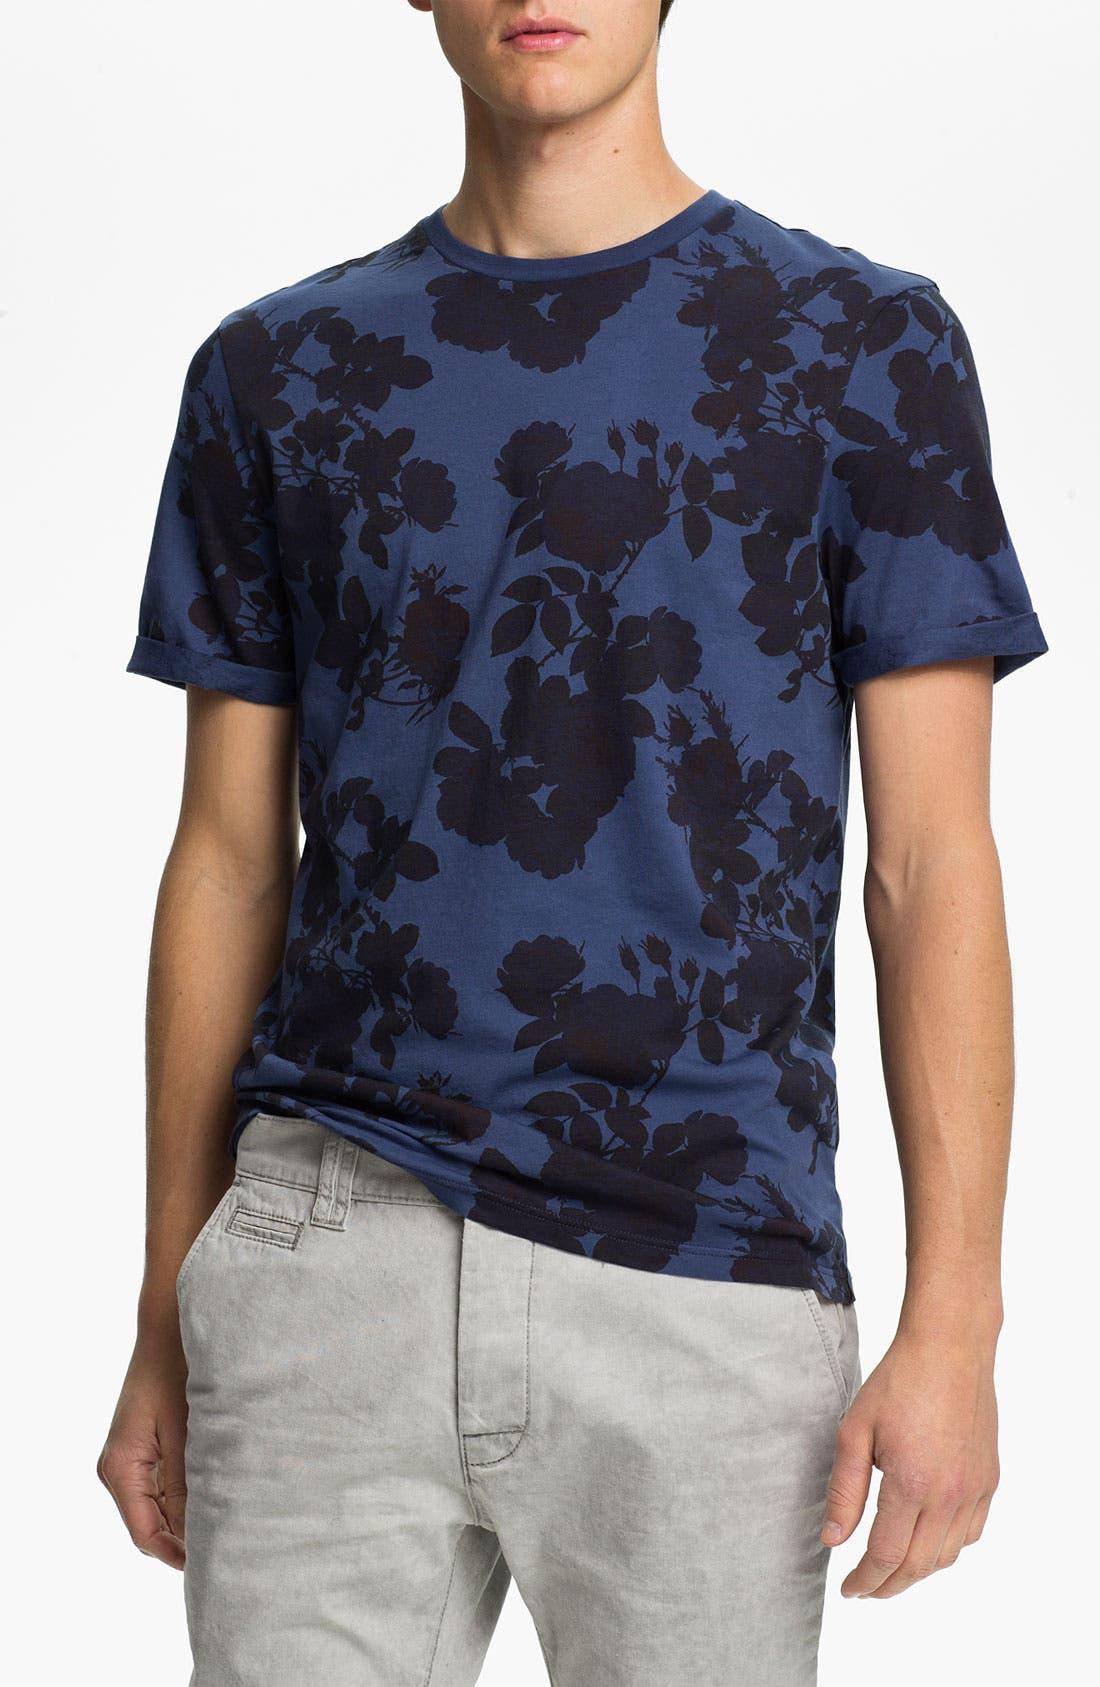 Alternate Image 1 Selected - Topman 'High Roller' Allover Floral Print T-Shirt